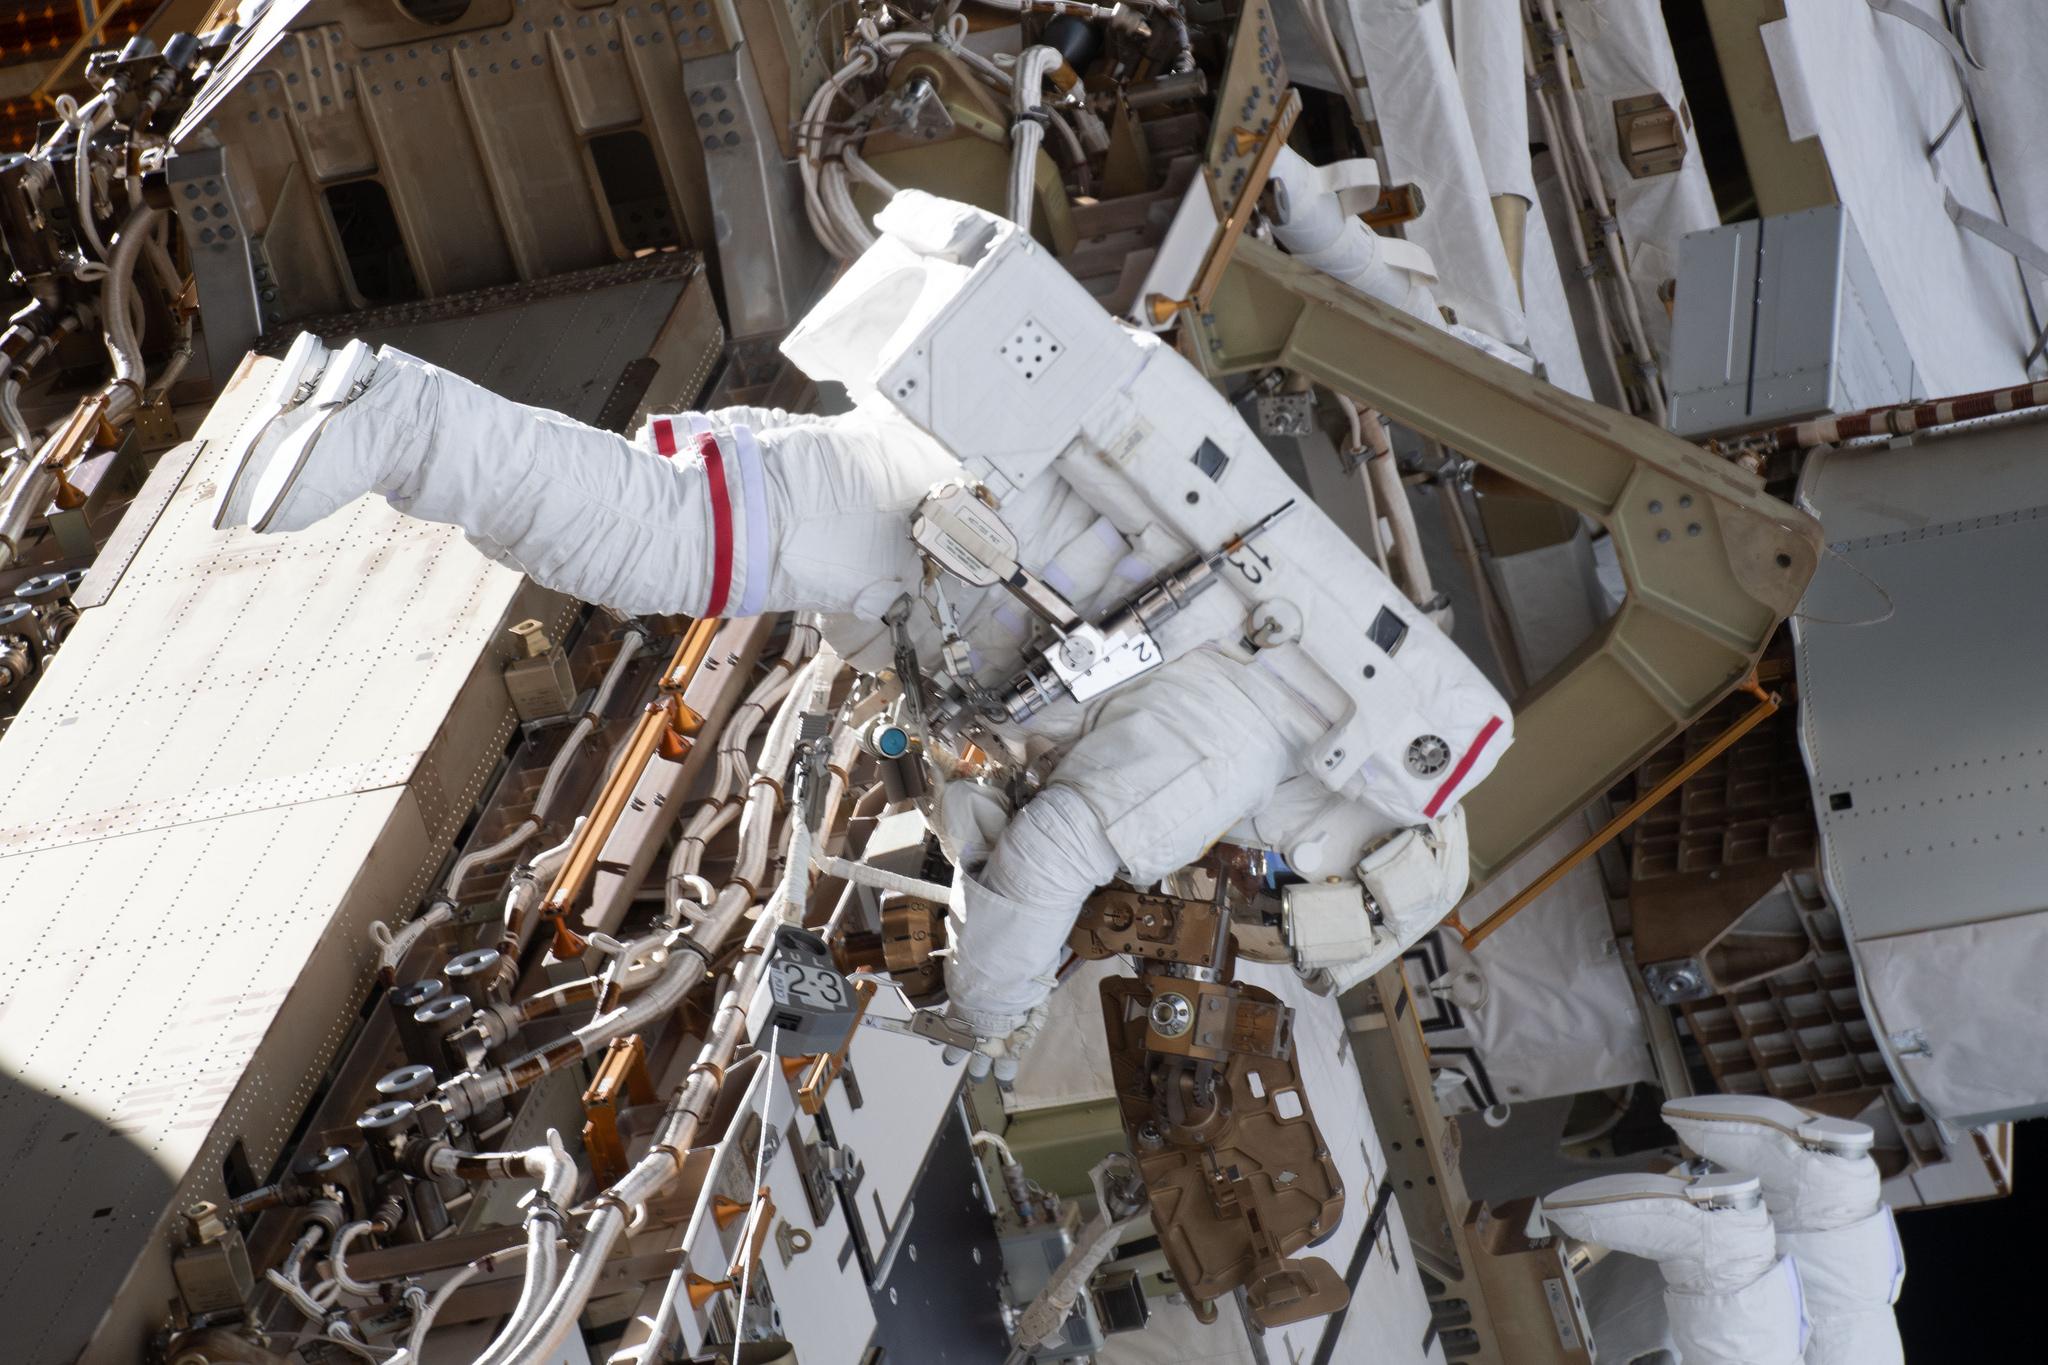 Anne McClain during her first spacewalk, U.S. EVA-52, on March 22, 2019. Credit: NASA